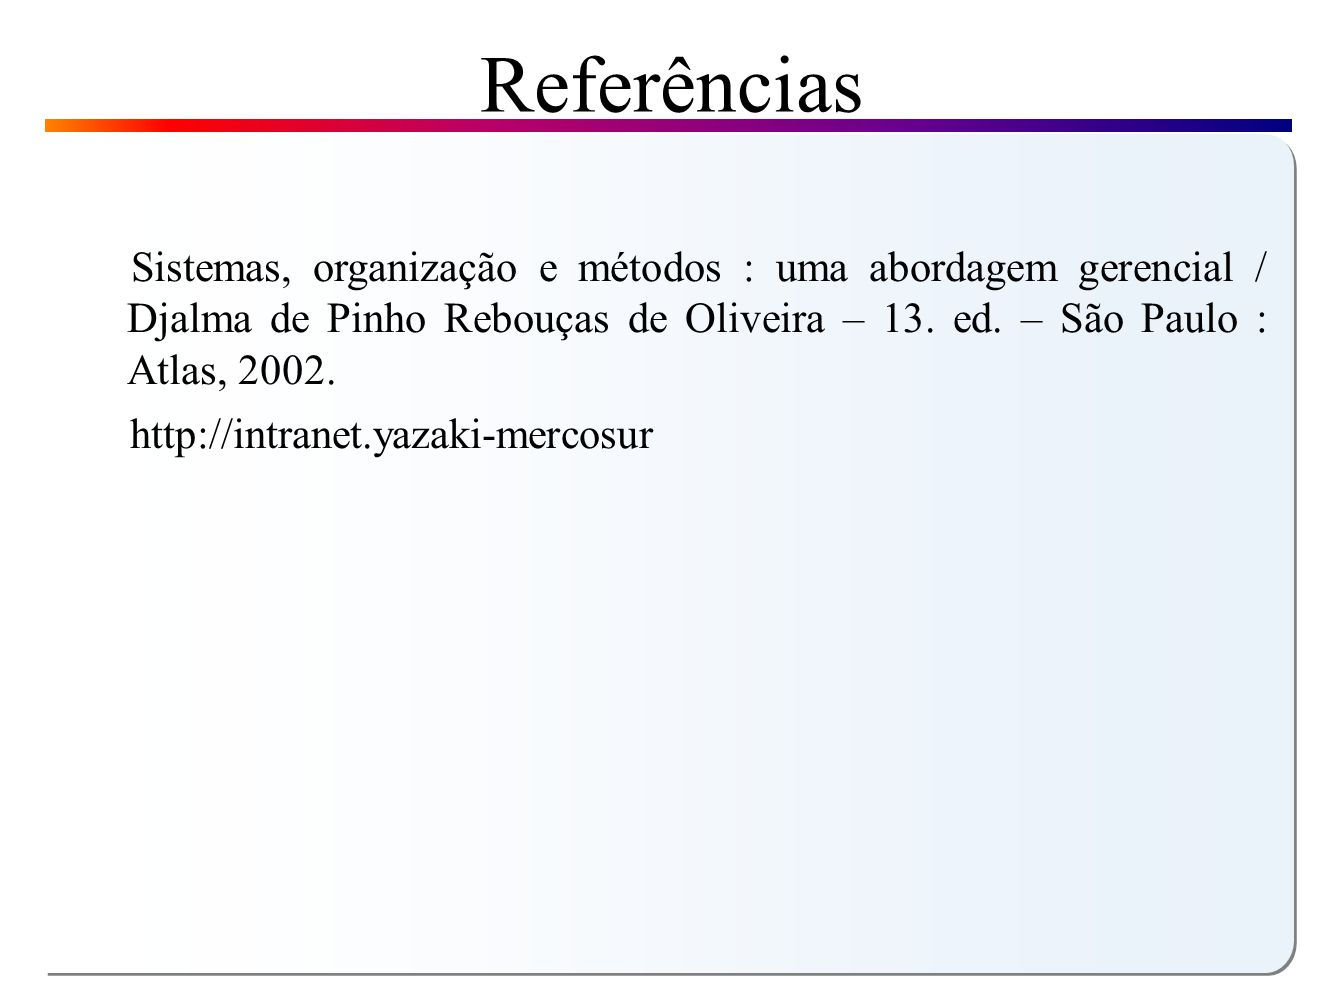 Referências http://intranet.yazaki-mercosur